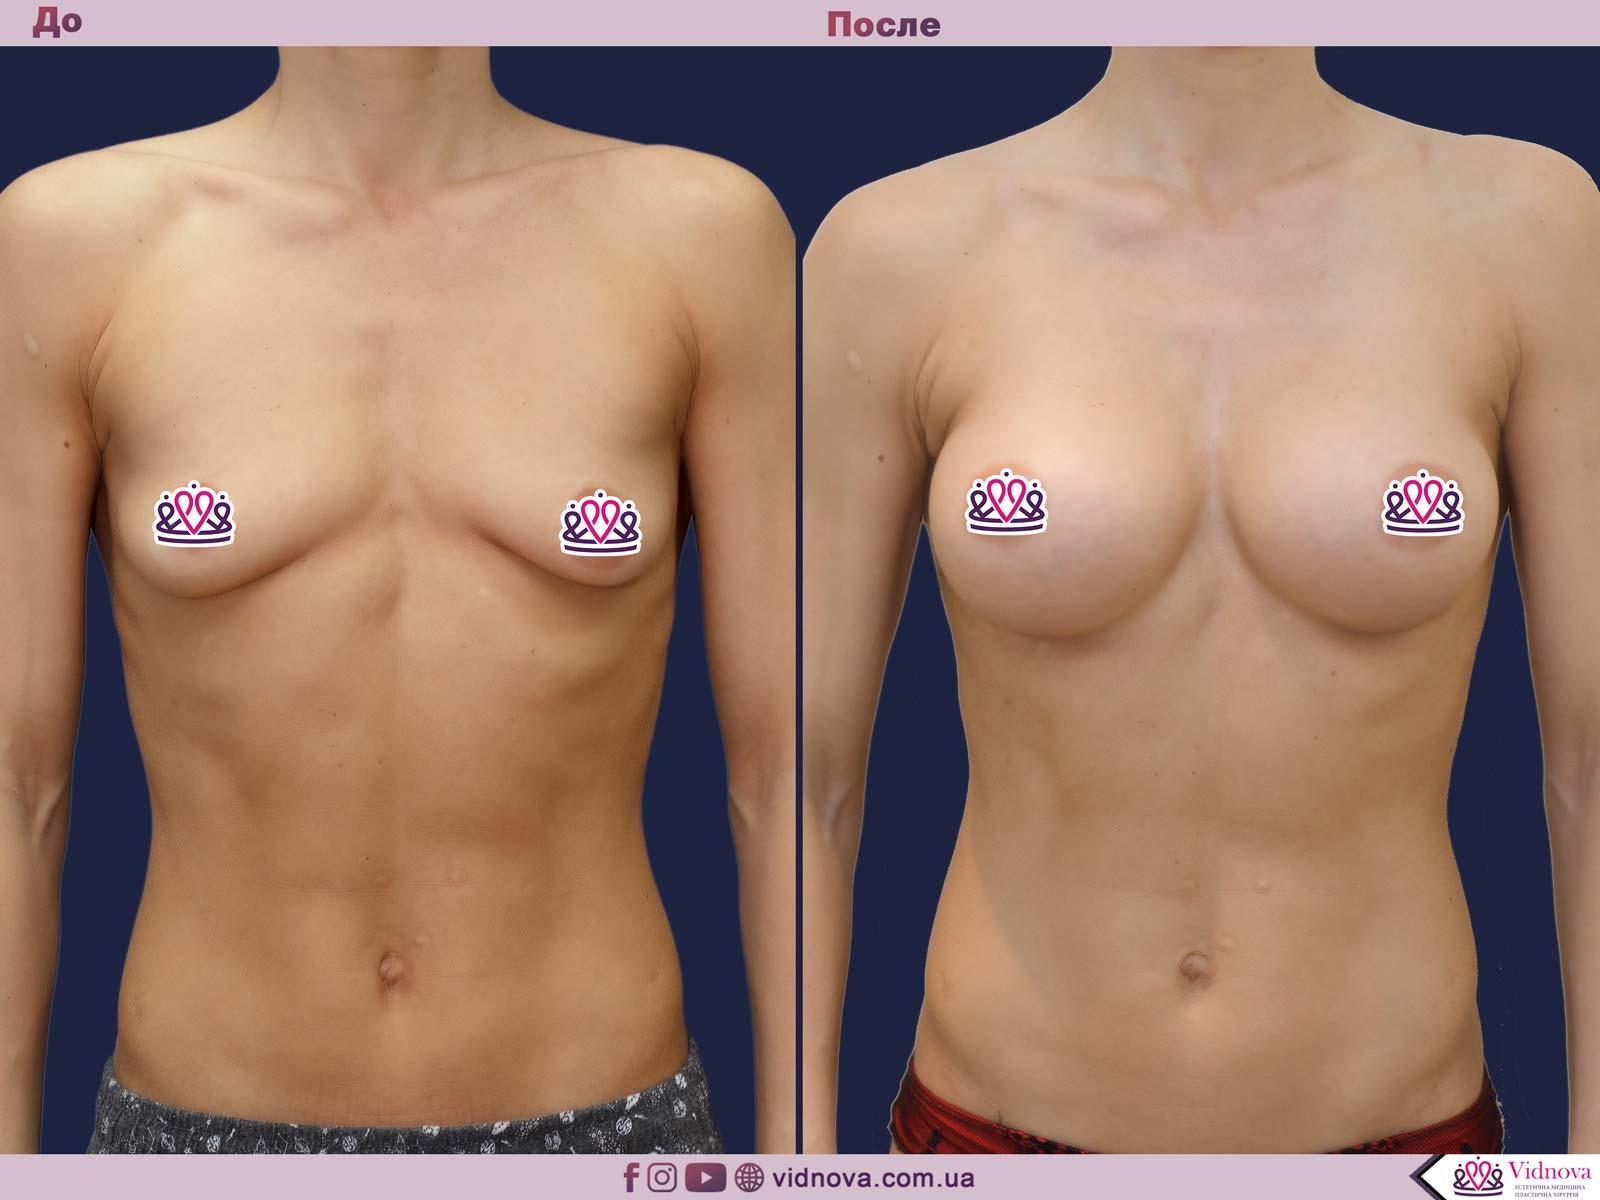 Увеличение груди: Фото ДО и ПОСЛЕ - Пример №67-1 - Клиника Vidnova